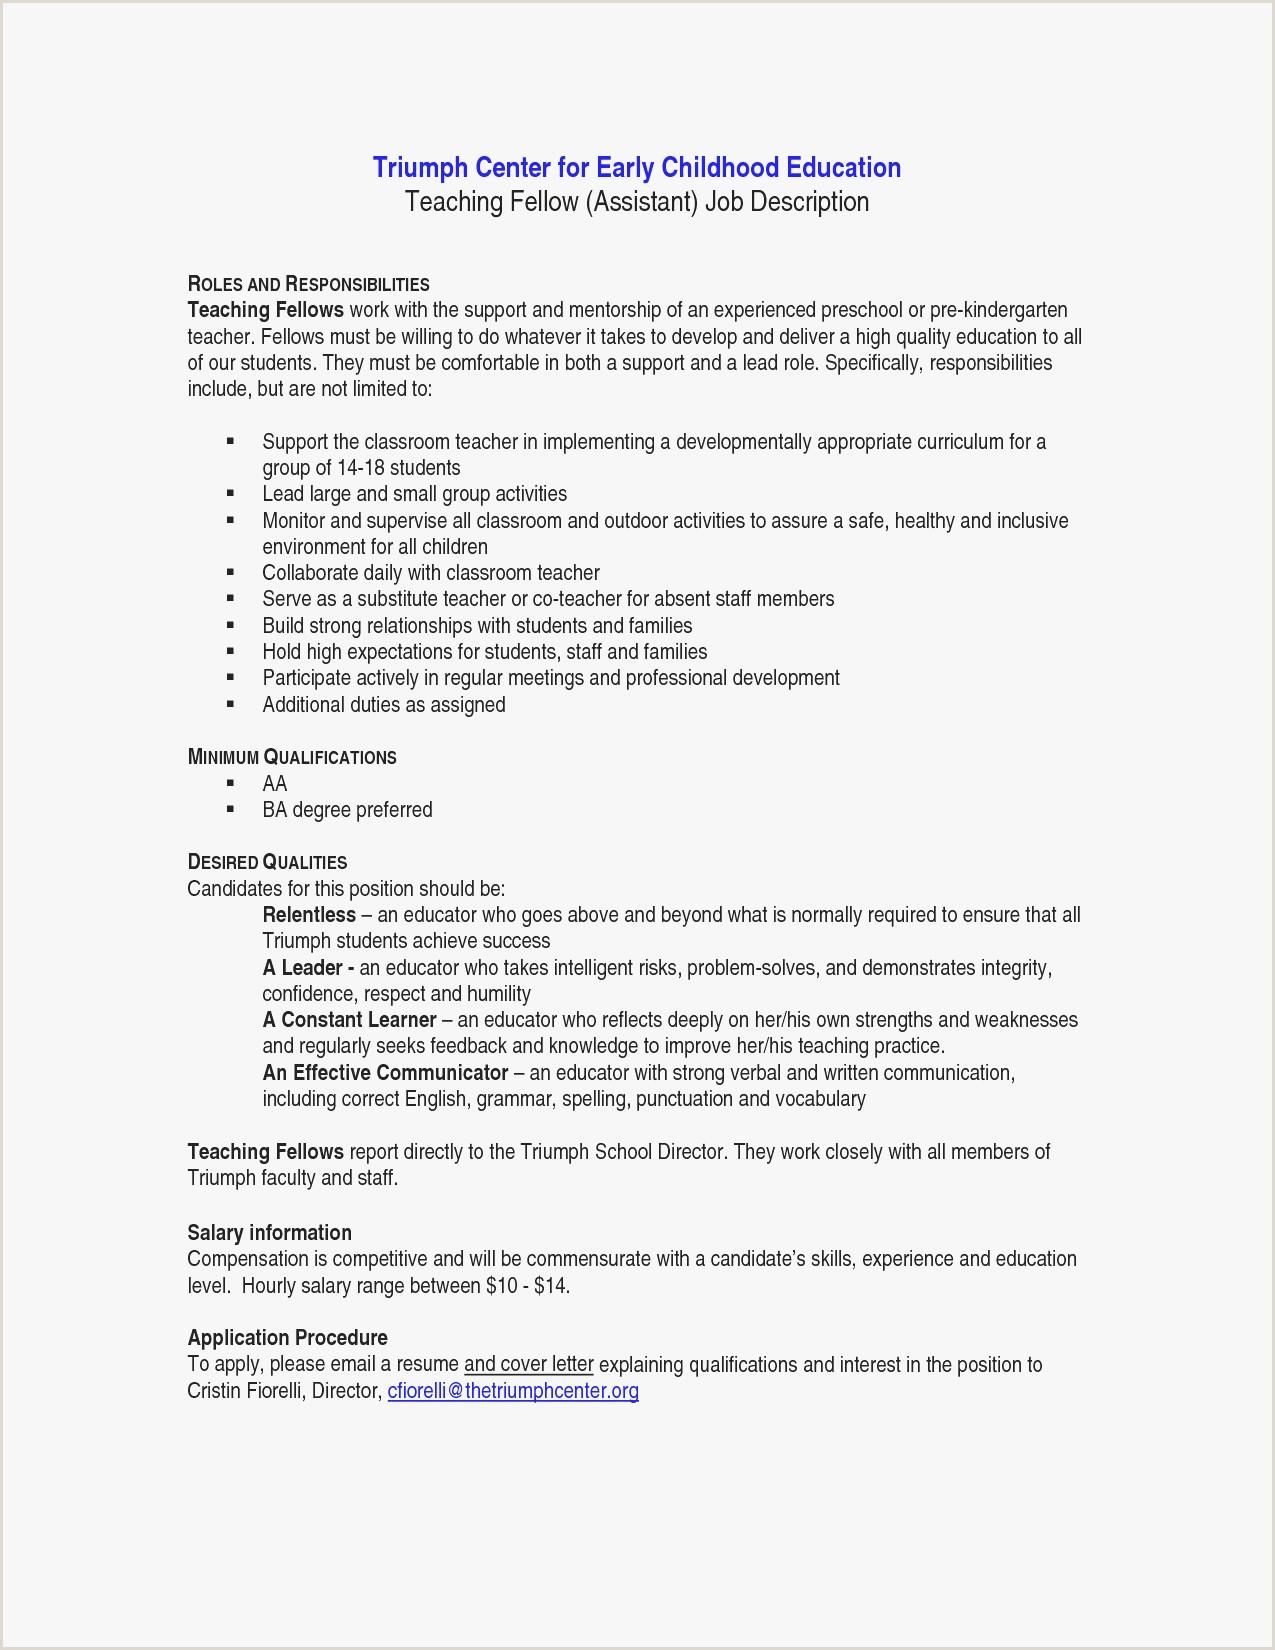 Curriculum Vitae Sample For Kindergarten Teacher New Resume